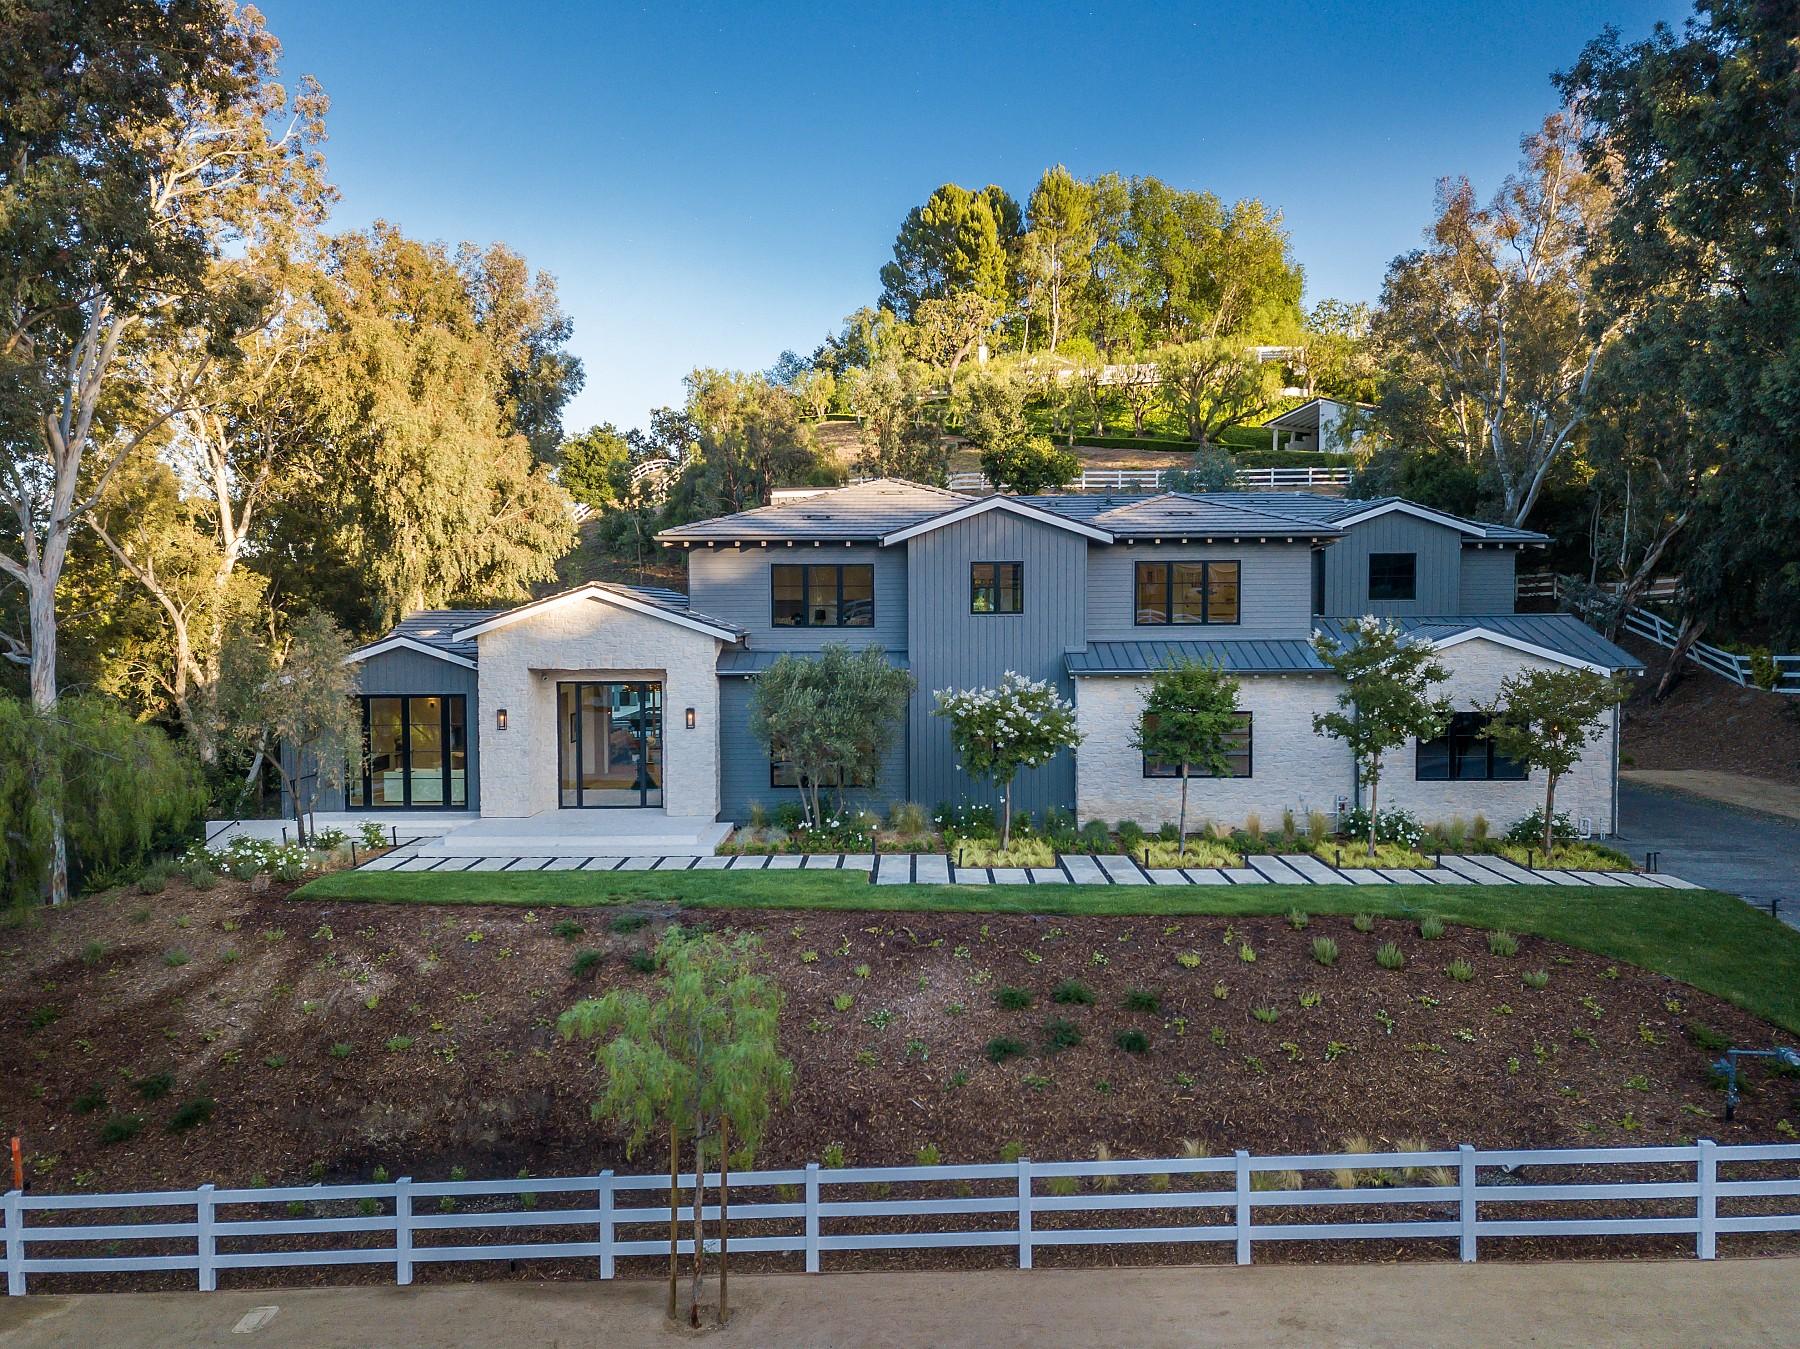 5716 Jed Smith Rd, Hidden Hills, CA 91302